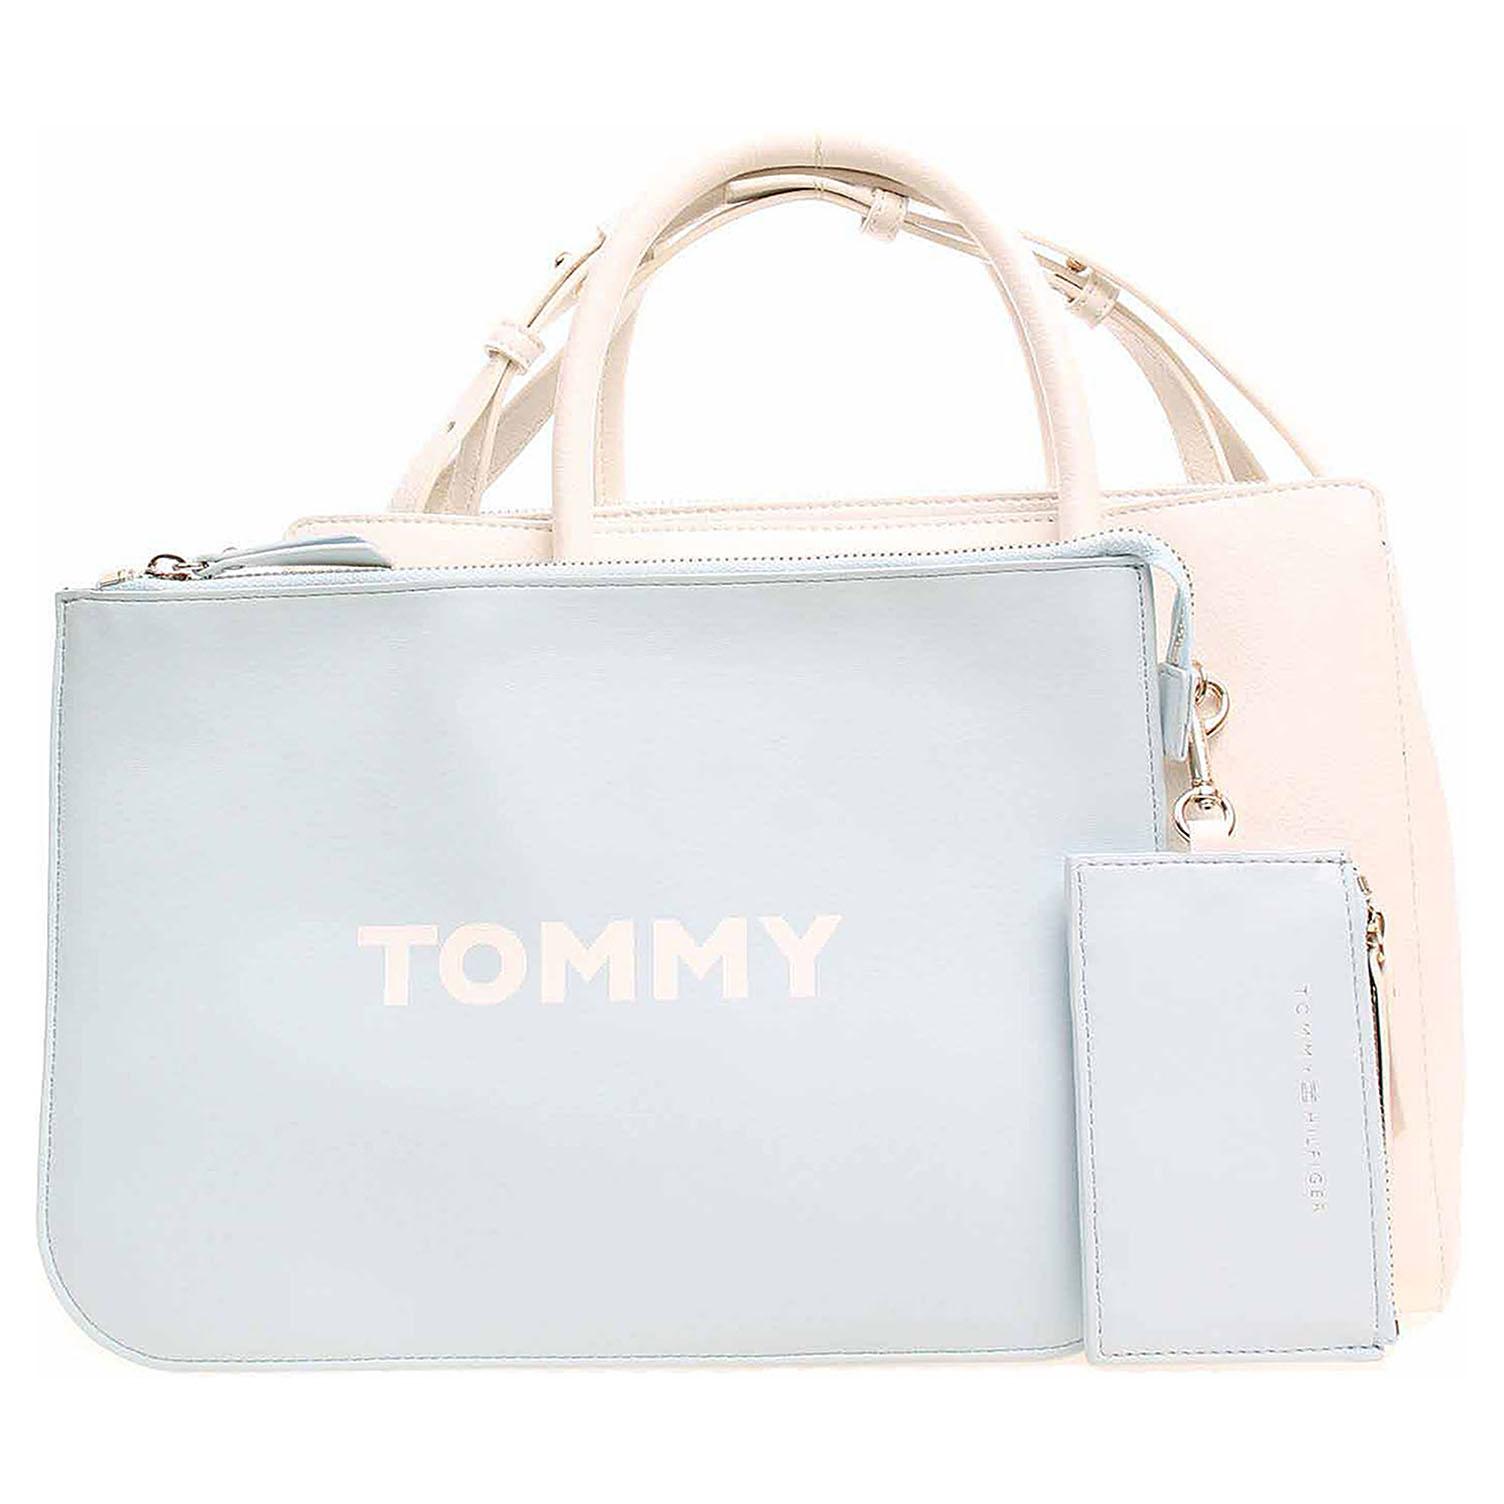 Ecco Tommy Hilfiger dámská kabelka AW0AW06487 104 bright white-tommy navy  11891496 accf72fb275